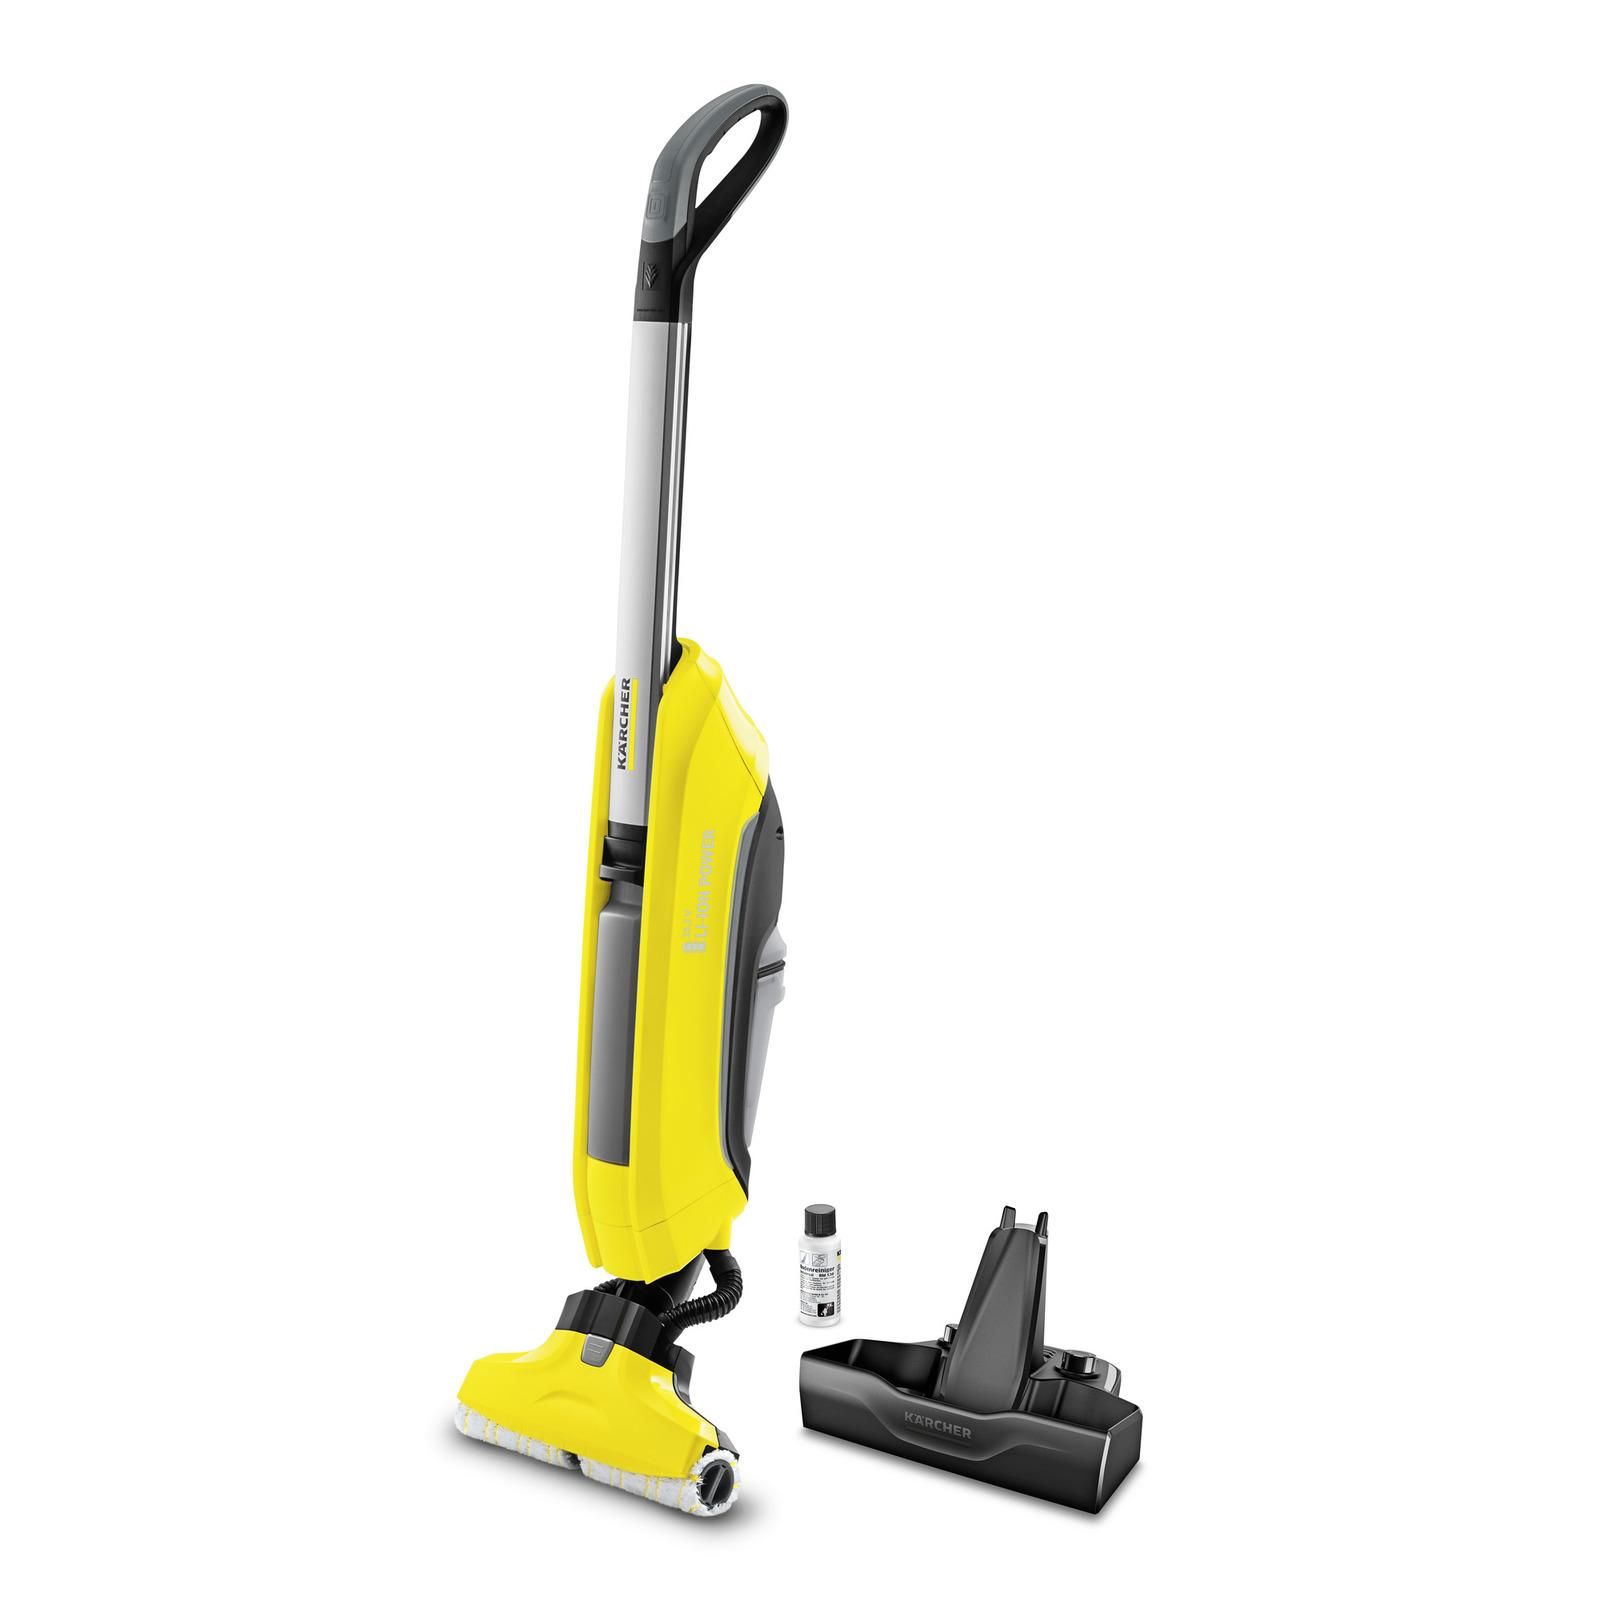 Kärcher - FC 5 Cordless Floor Cleaner